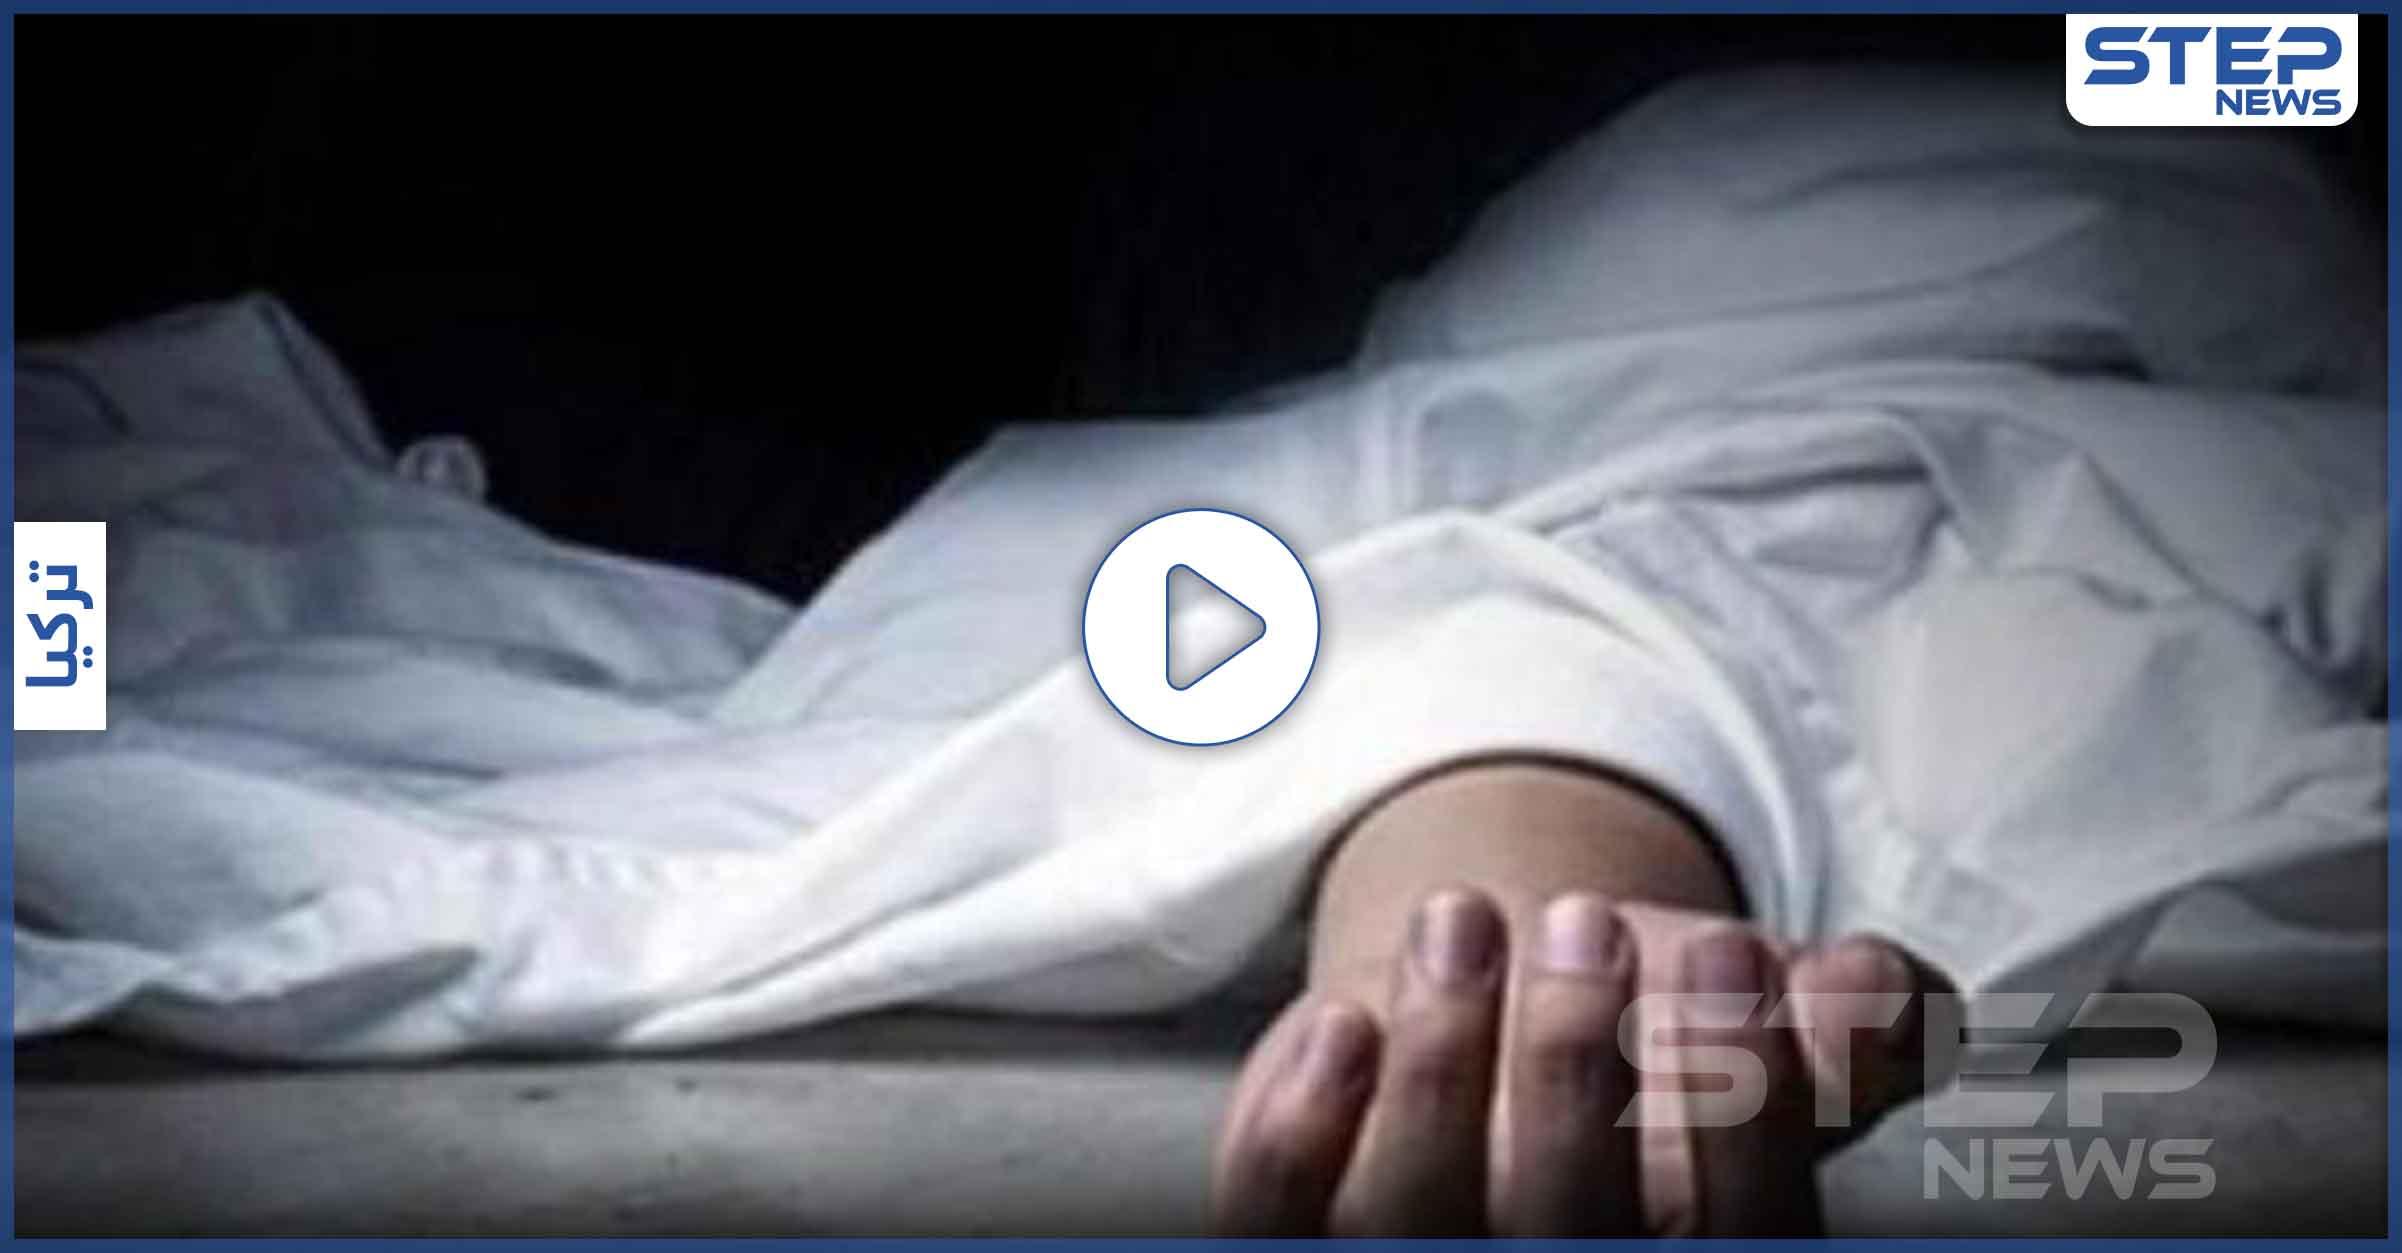 بالفيديو || ما بين جرابلس و أنطاكيا.. ثلاث حالات انتحار للسوريين رمياً وشنقاً وغرقاً